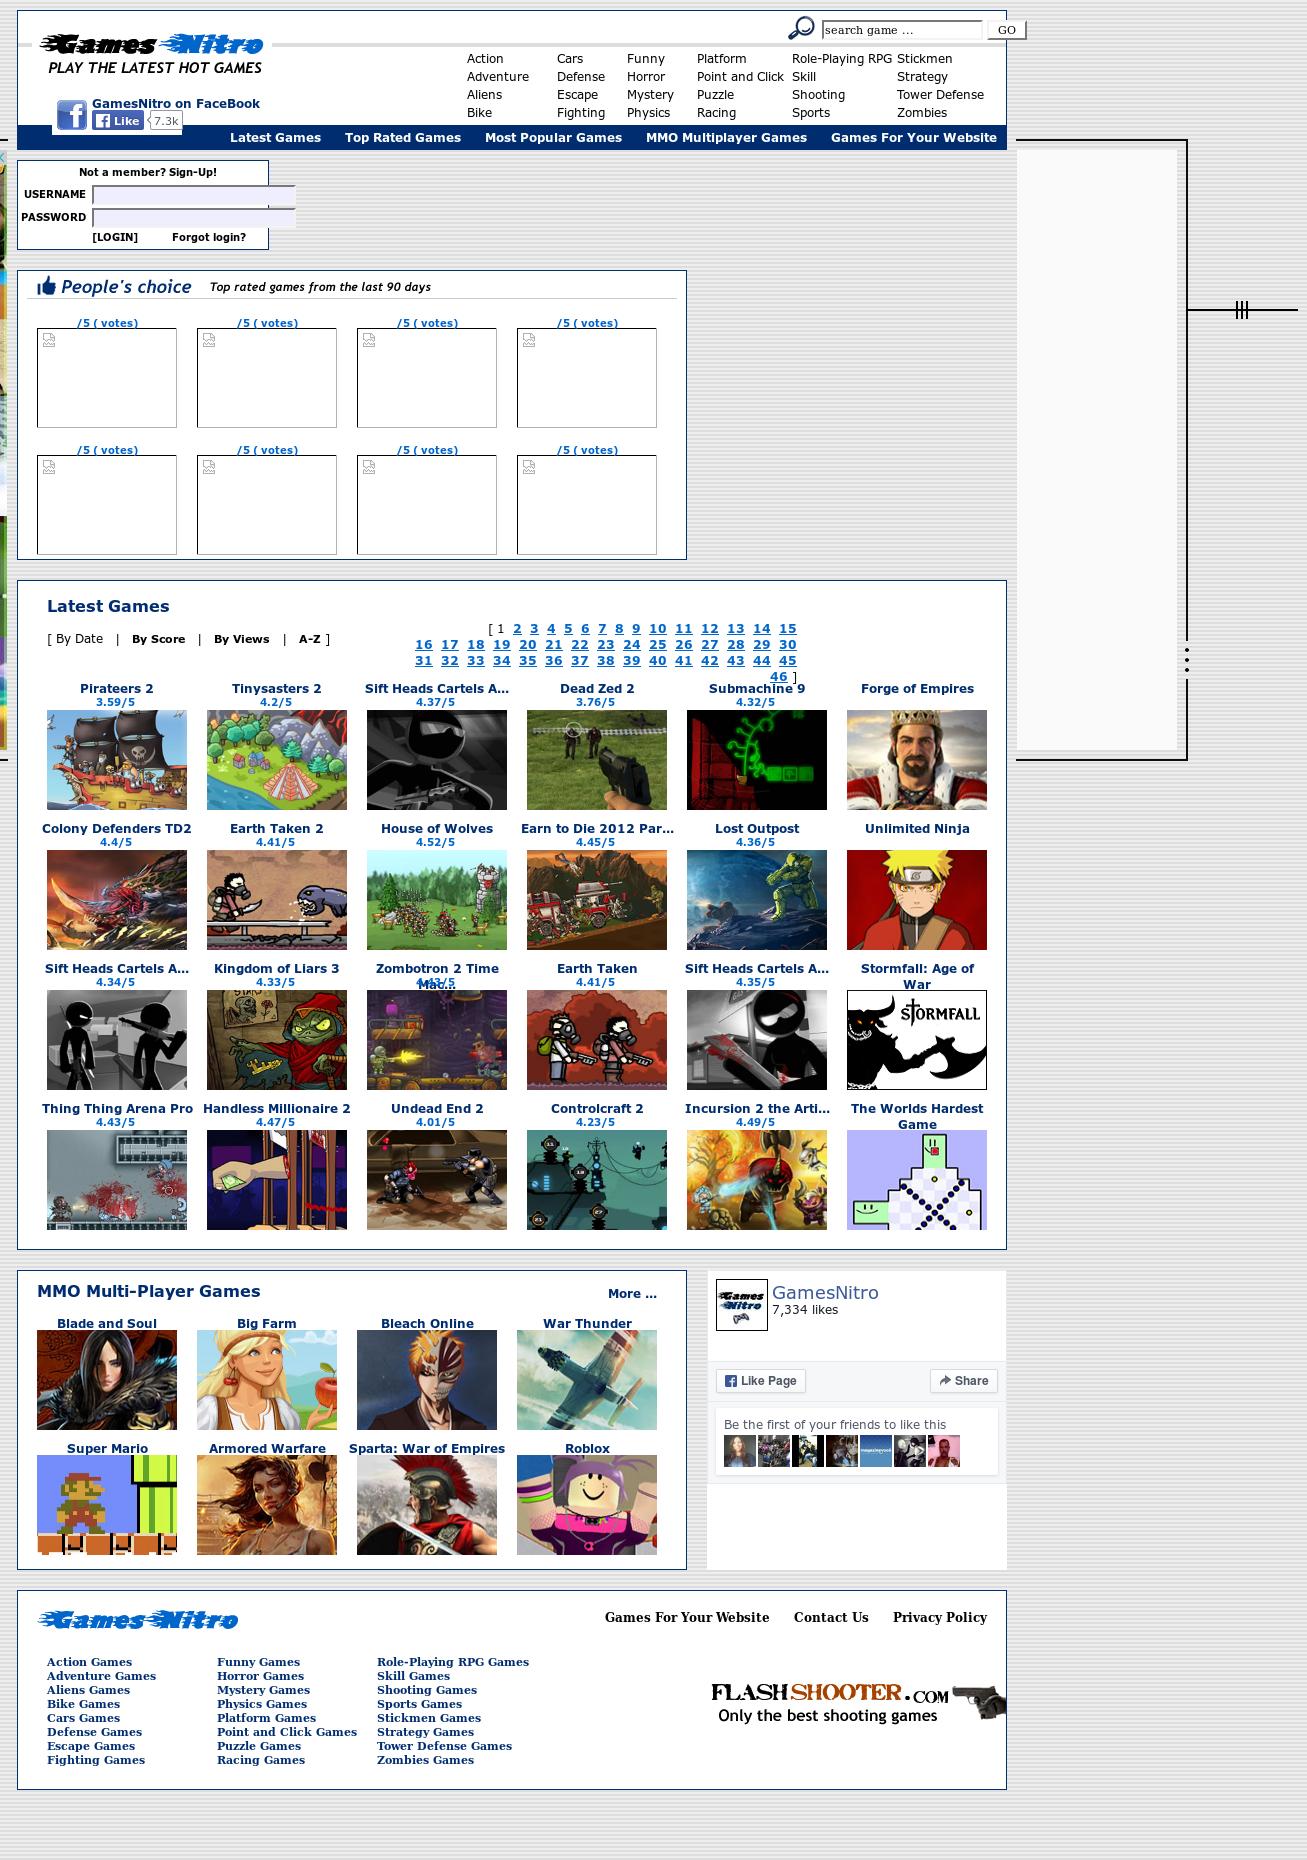 Gamesnitro Competitors, Revenue and Employees - Owler